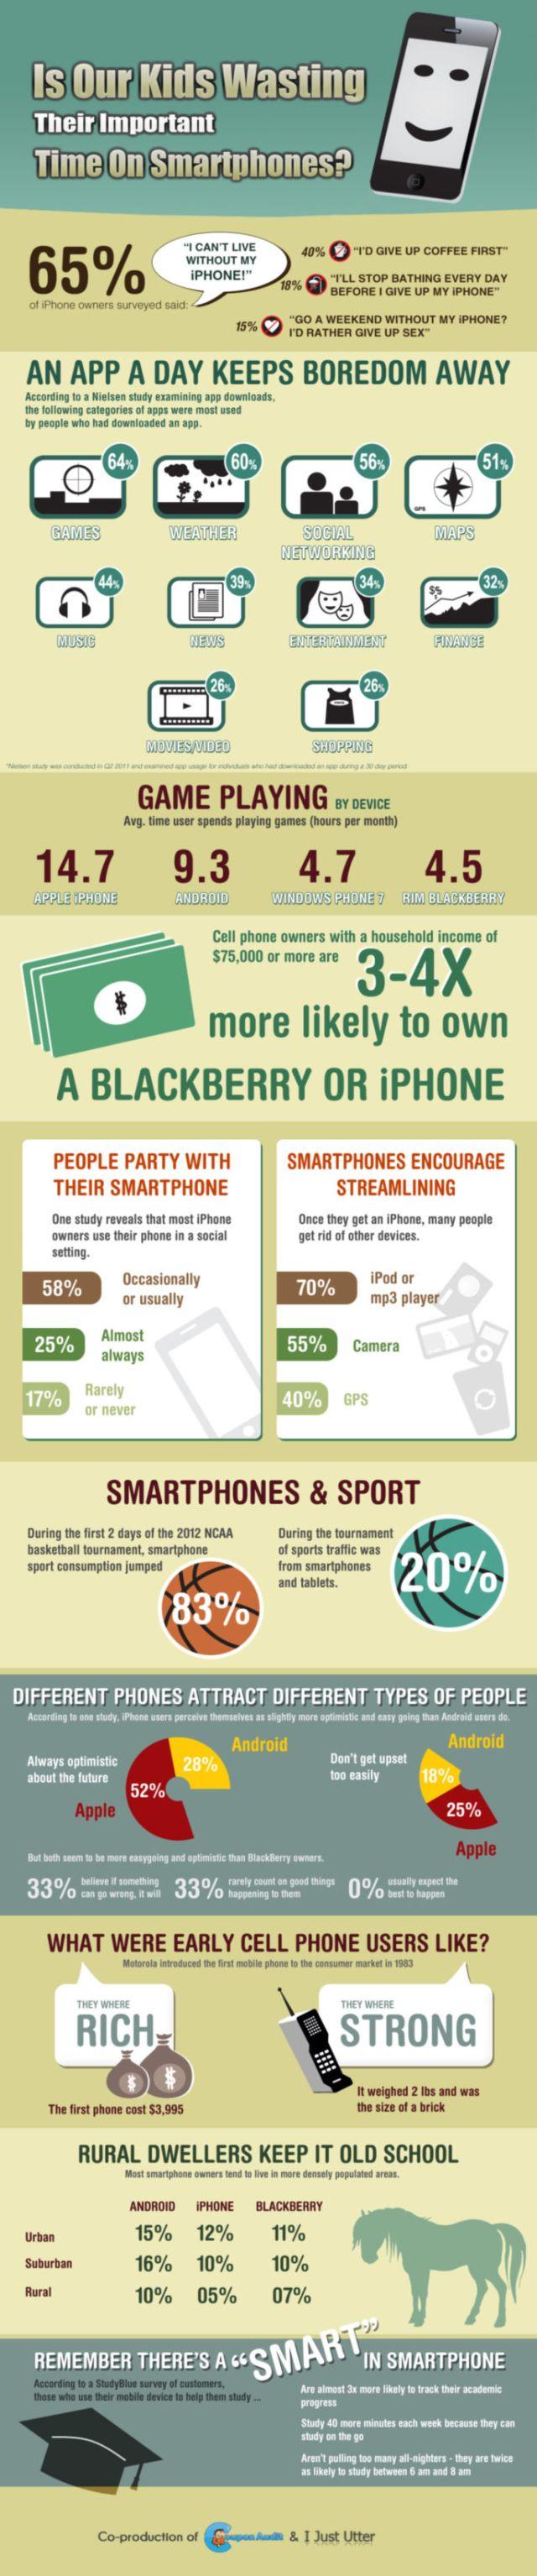 Kids Wasting time on Smartphones